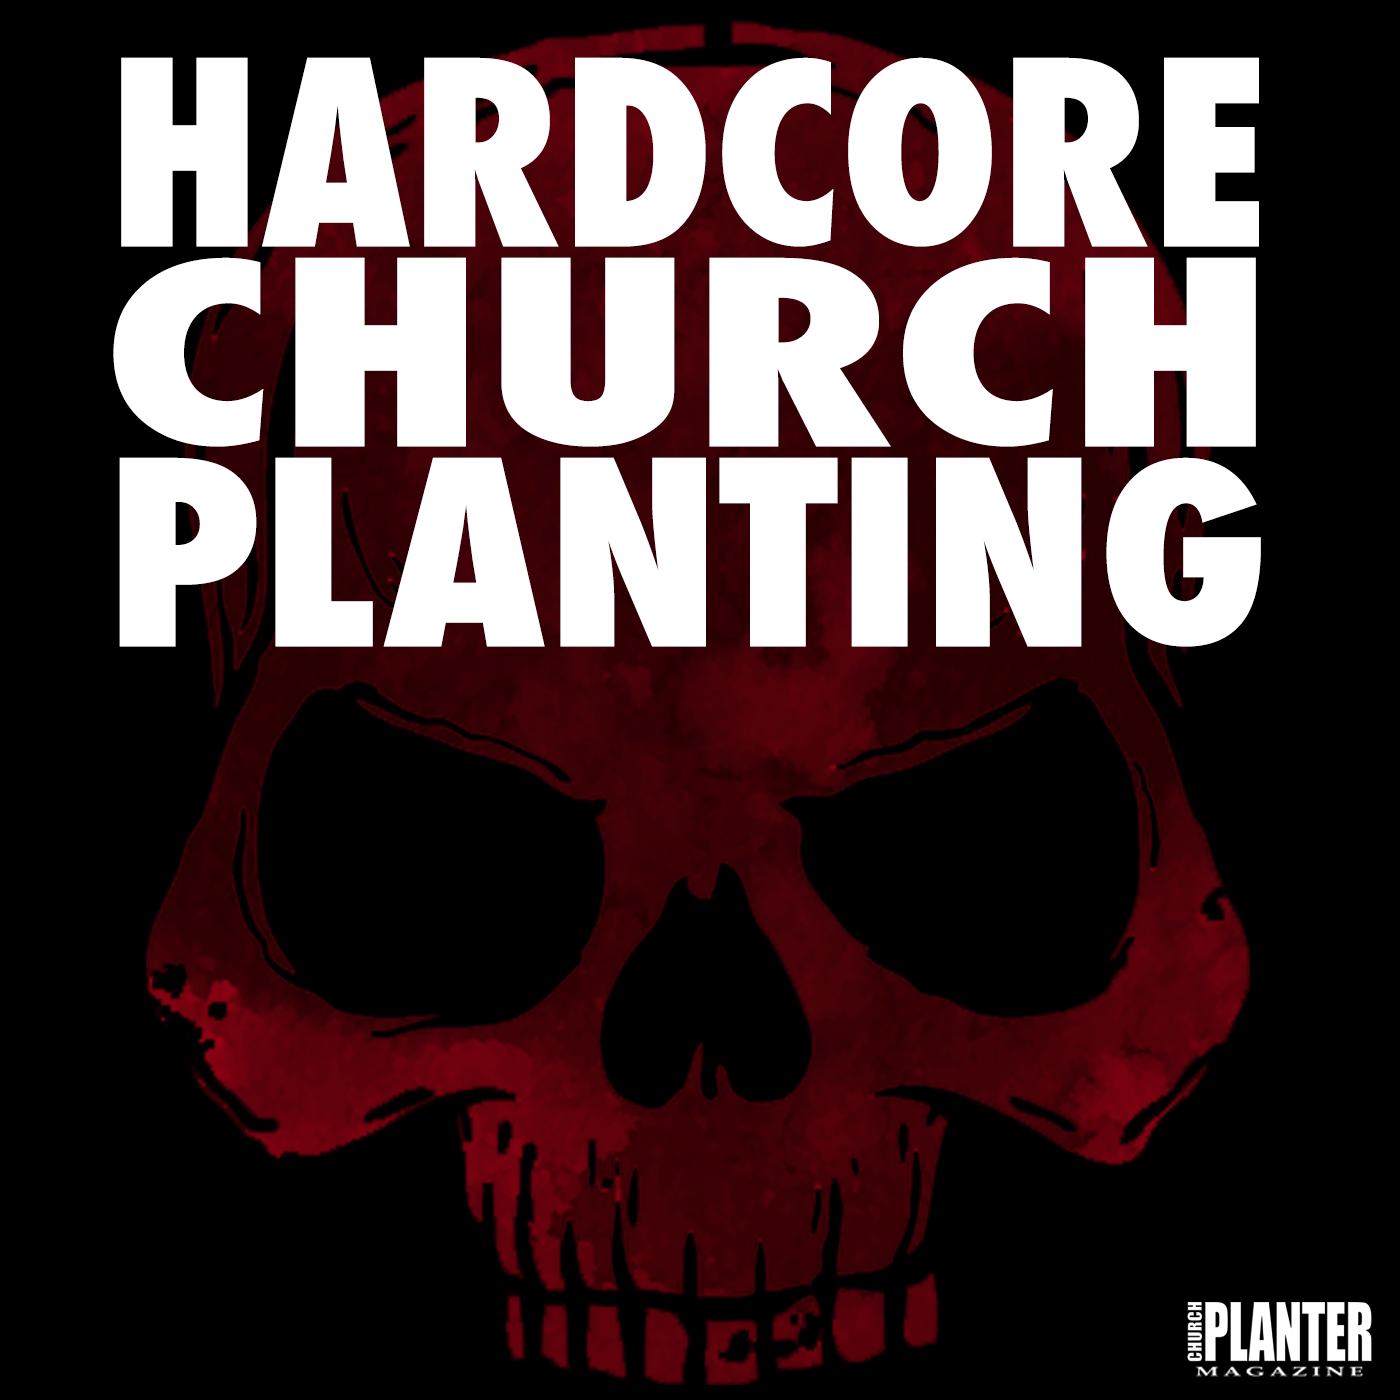 Hardcore Church Planting